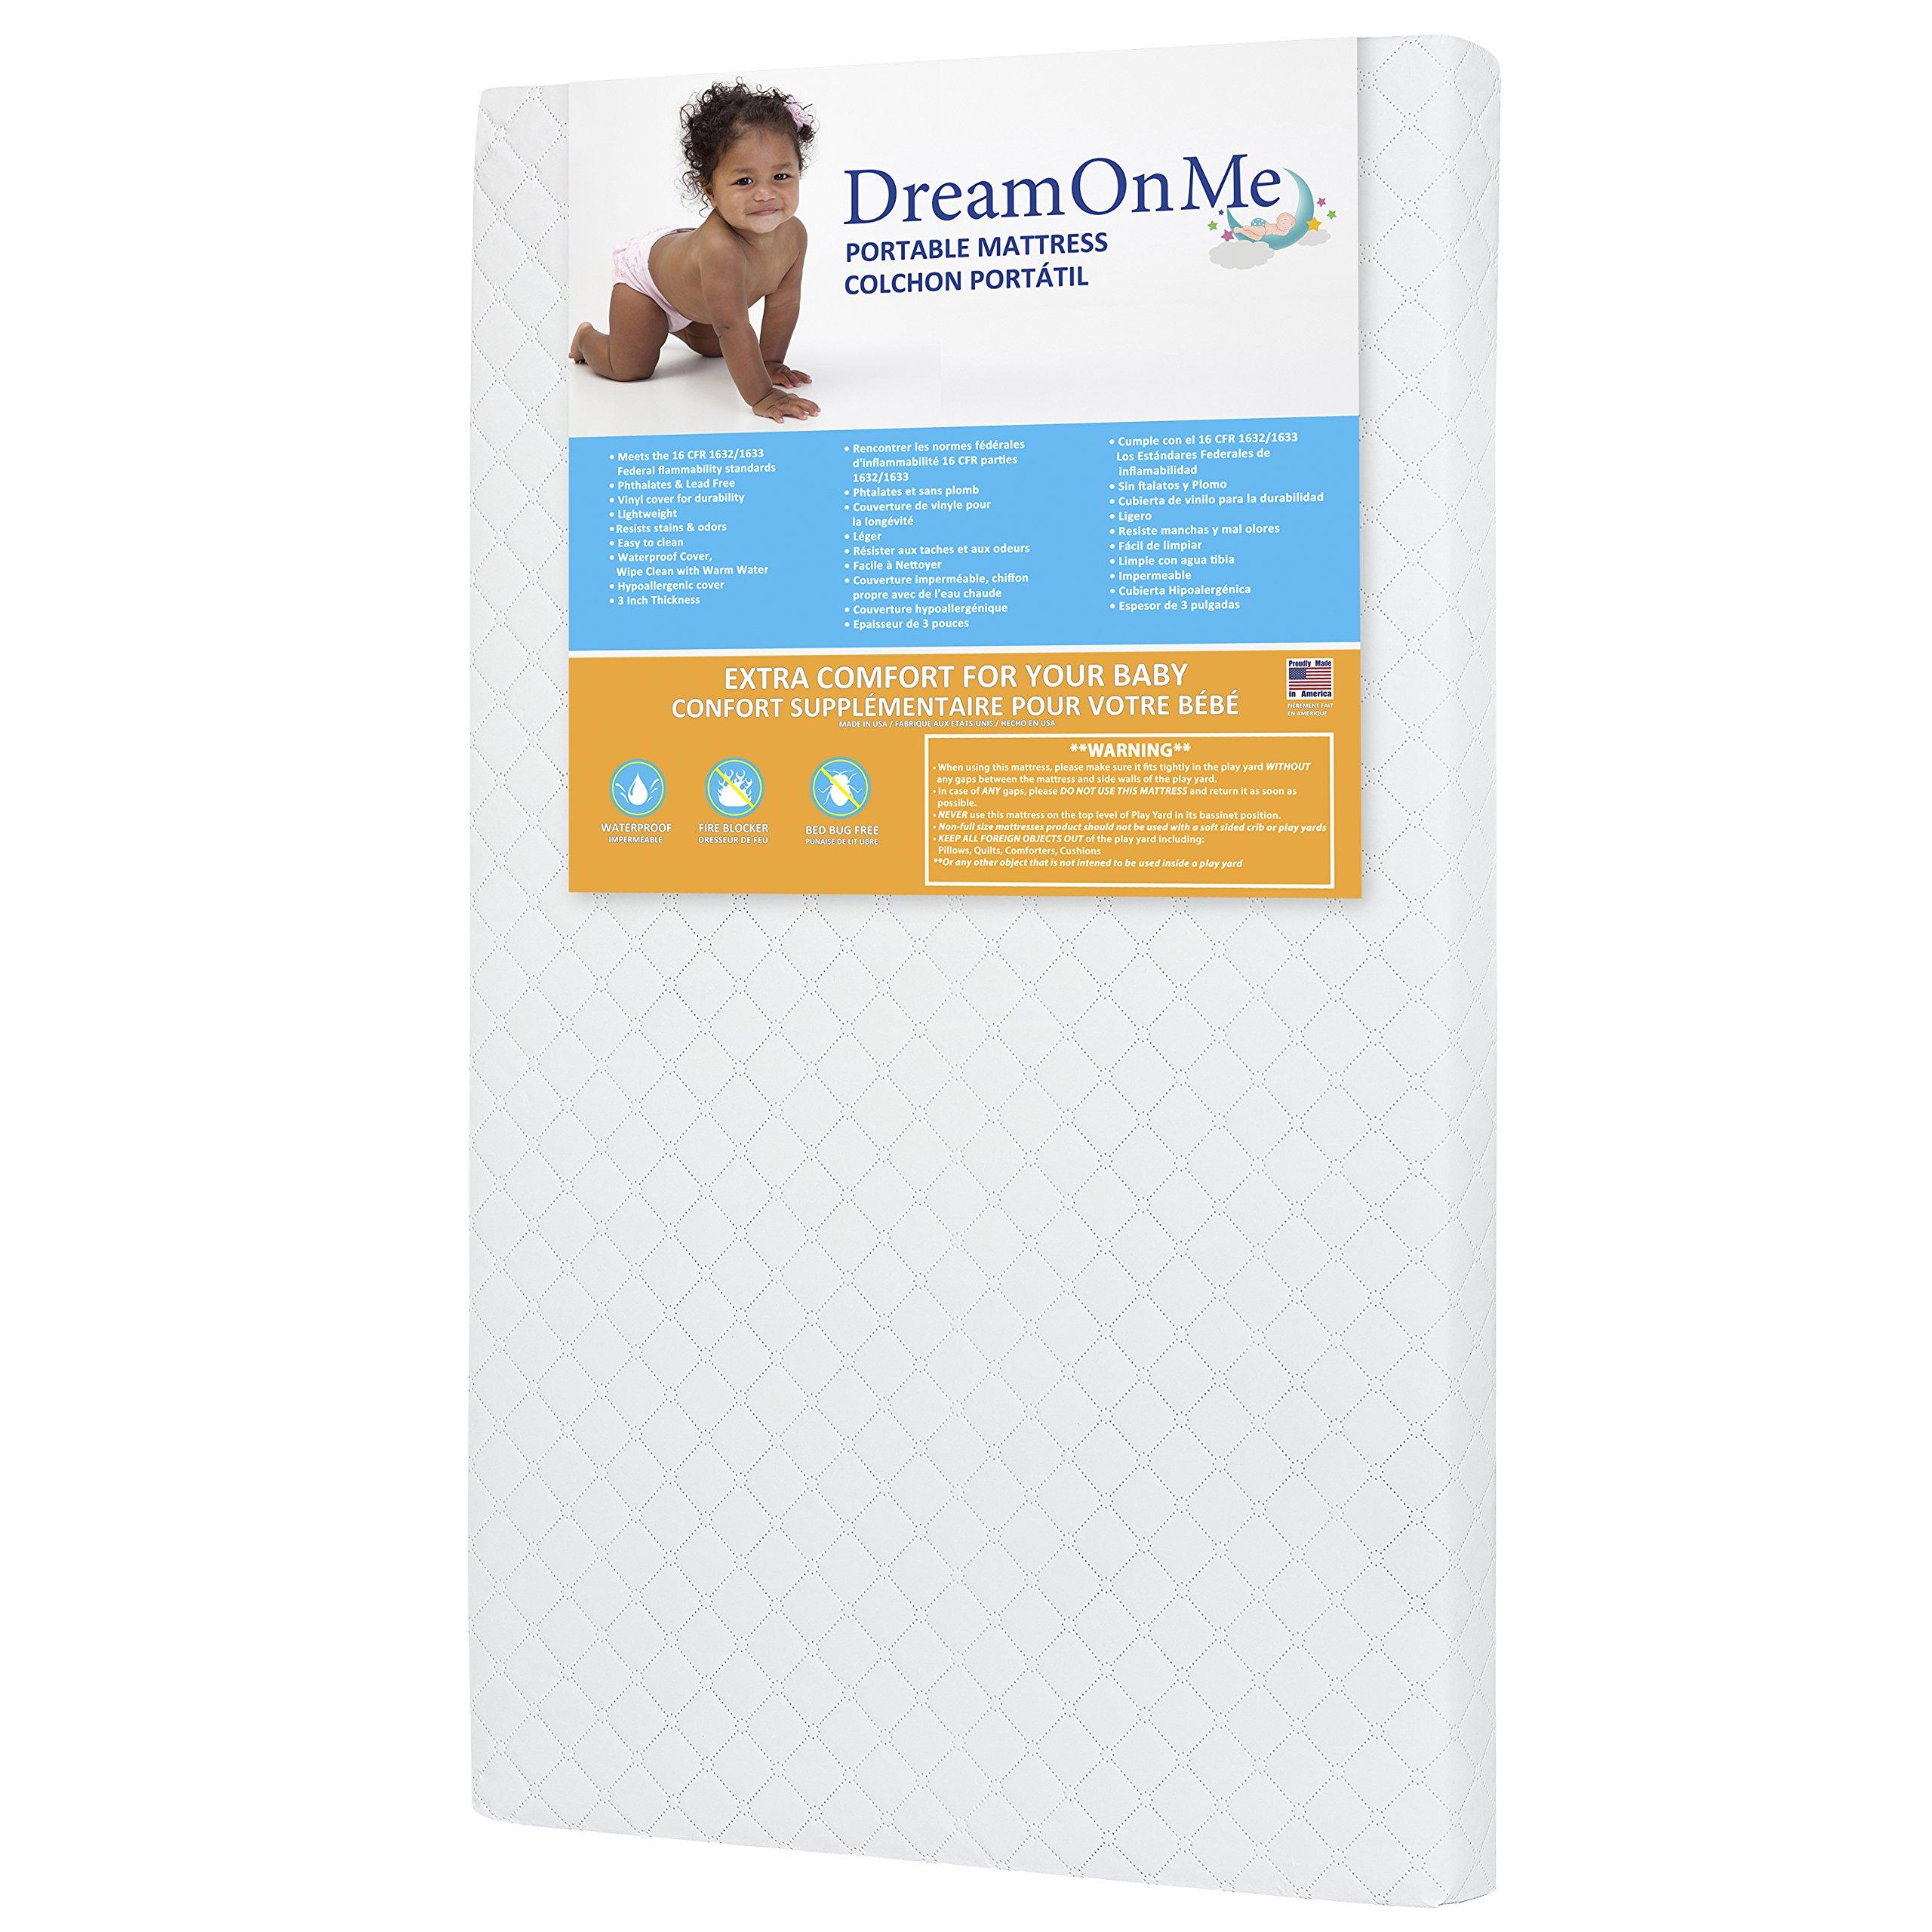 Dream On Me 3 Mini/Portable Crib Mattress, White by Dream On Me